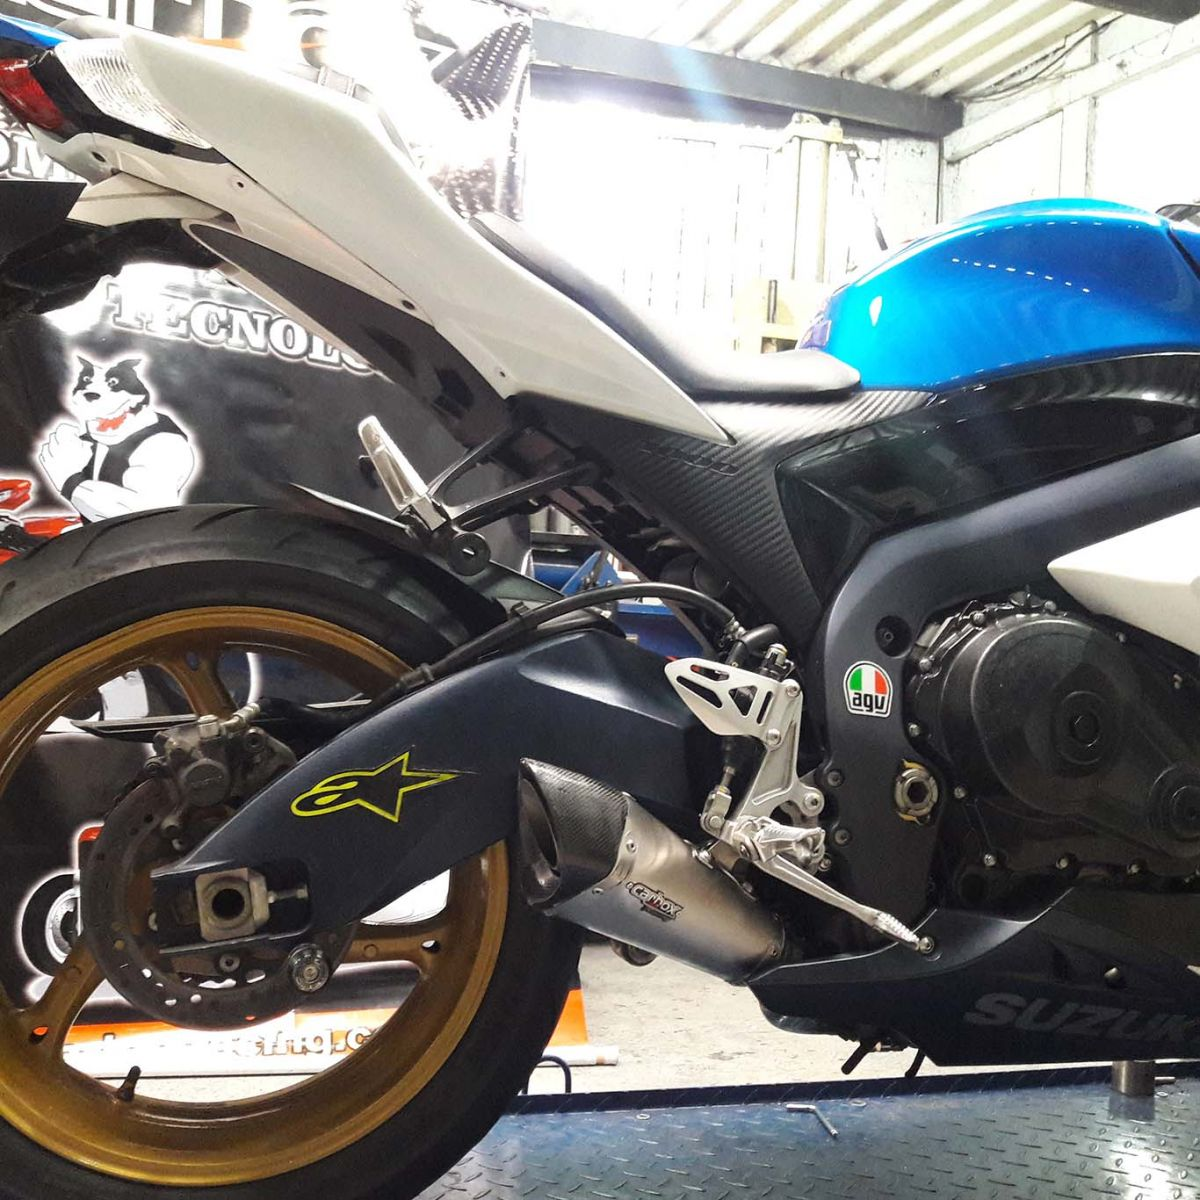 Ponteira Scorpion GP720 Inox p/ Suzuki SRAD GSXR1000 11 a 13